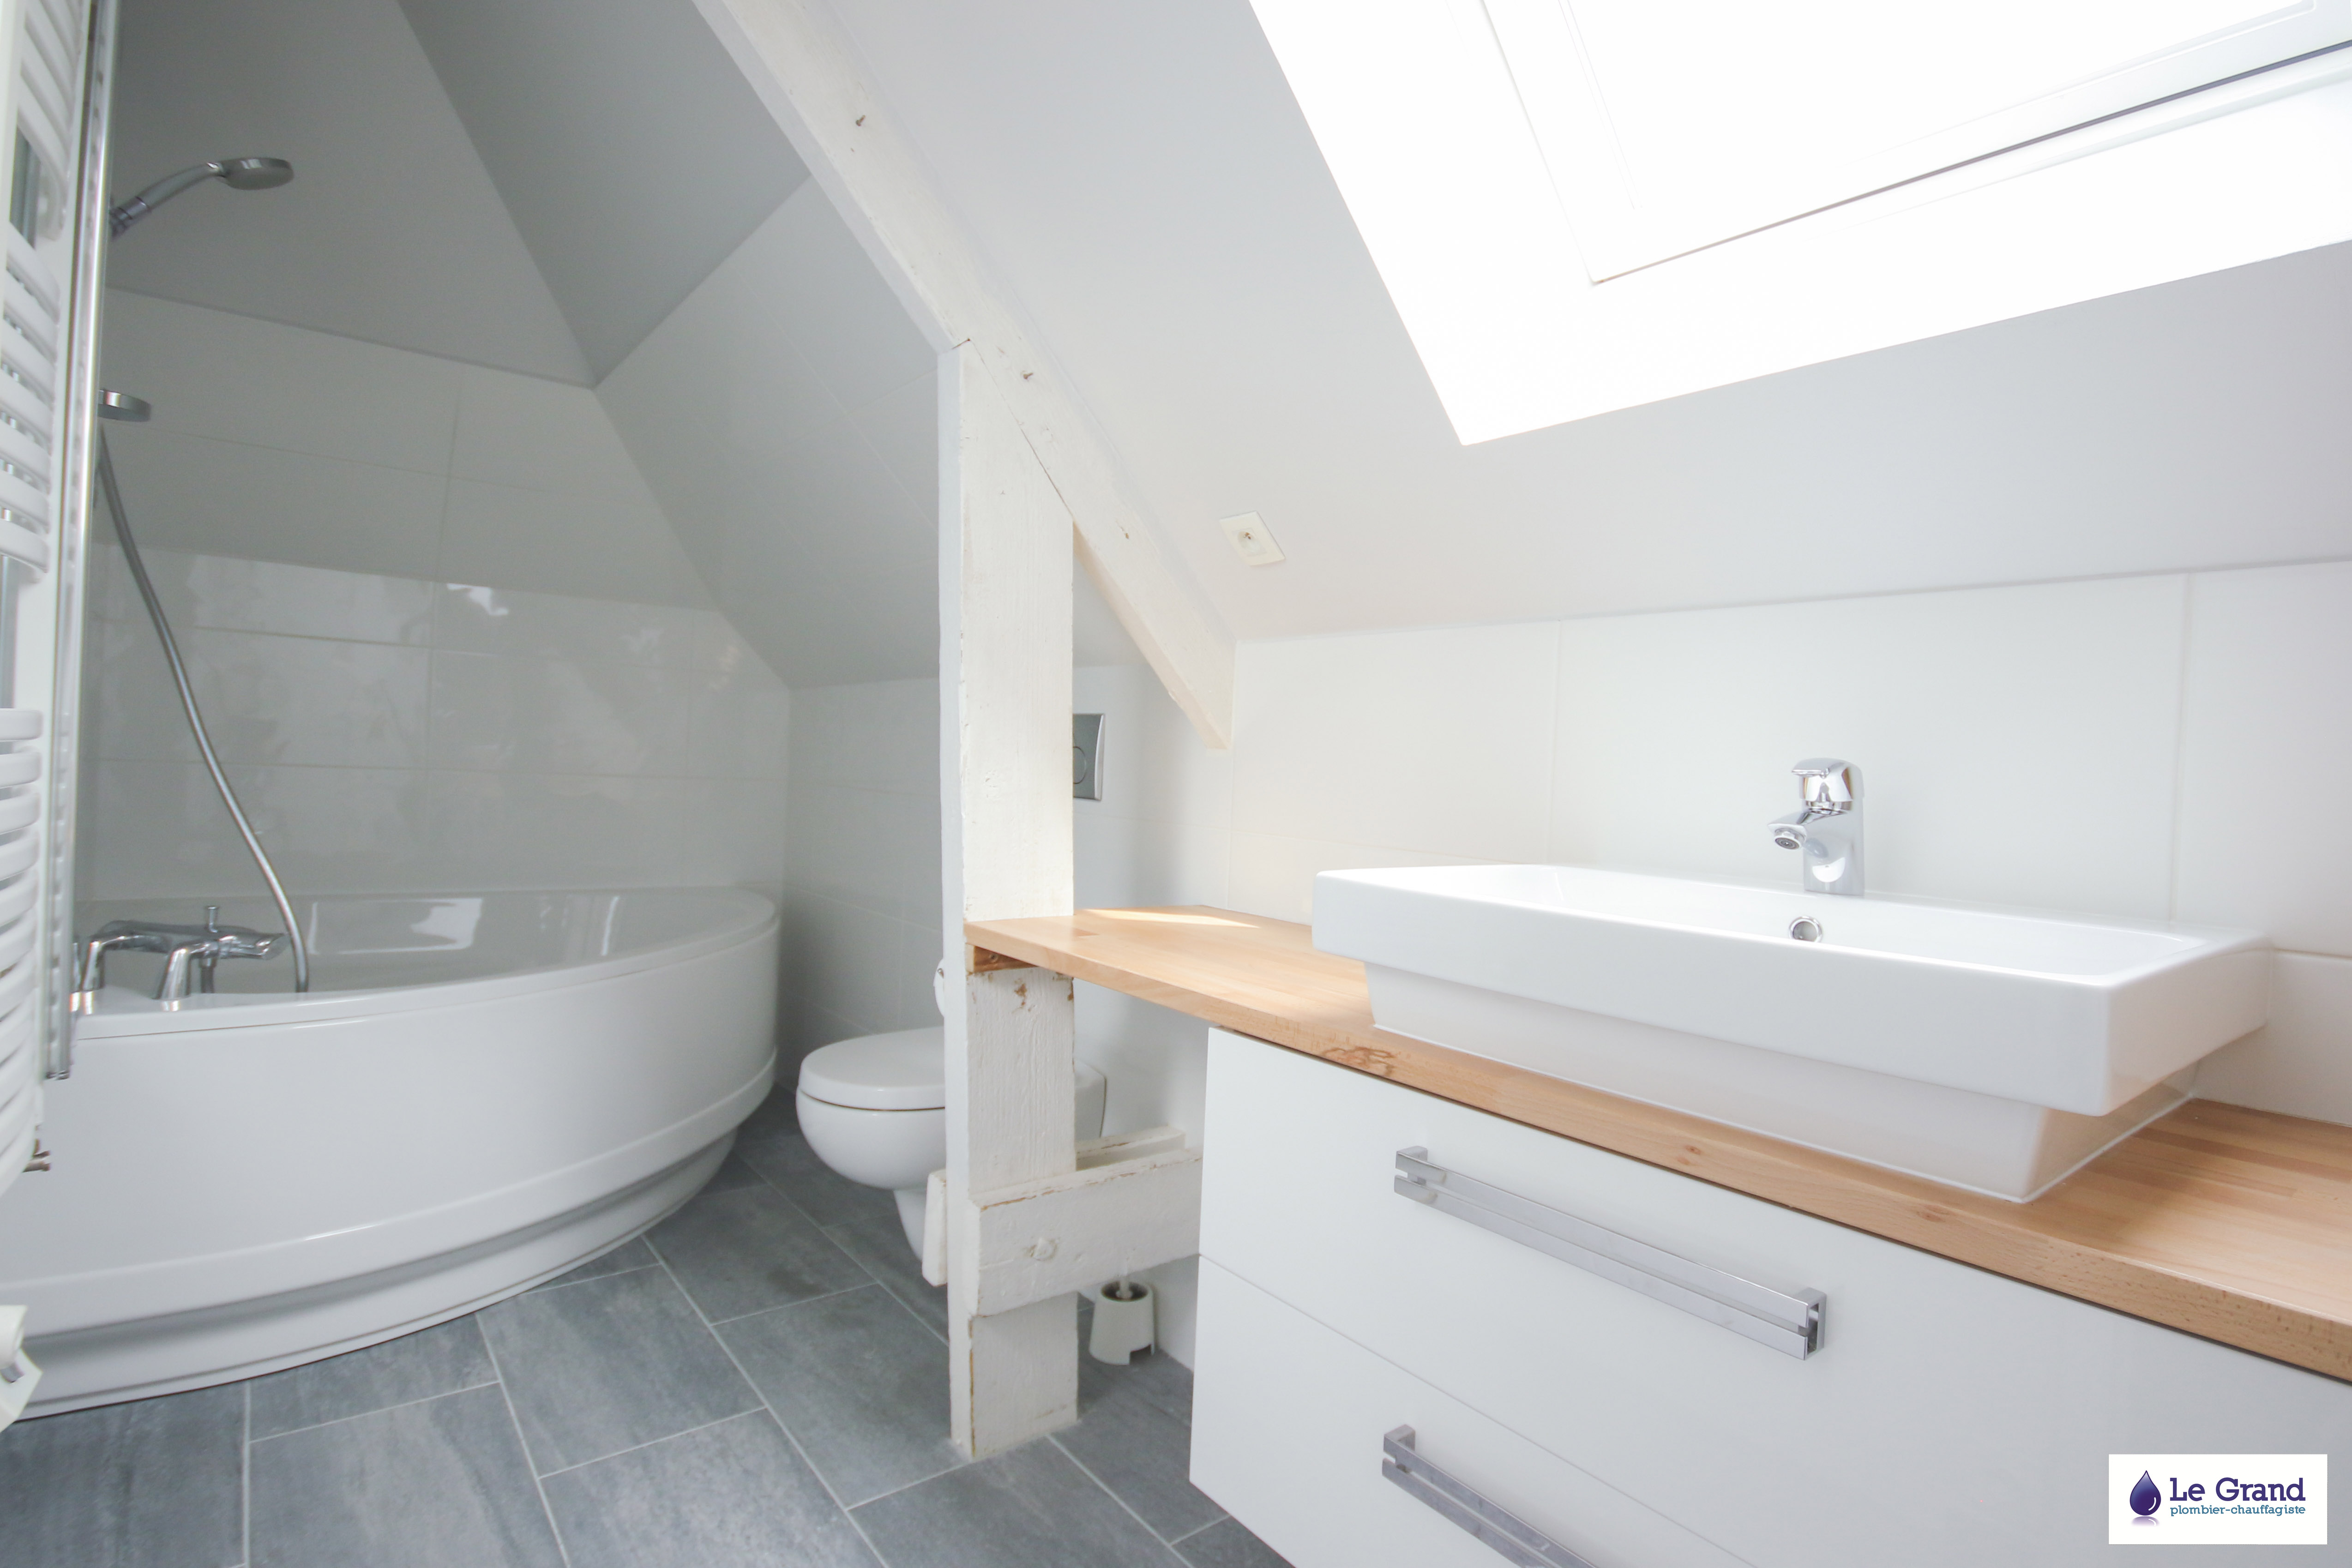 le grand plombier chauffagiste rennes salle de bains bruz le grand plombier chauffagiste rennes. Black Bedroom Furniture Sets. Home Design Ideas